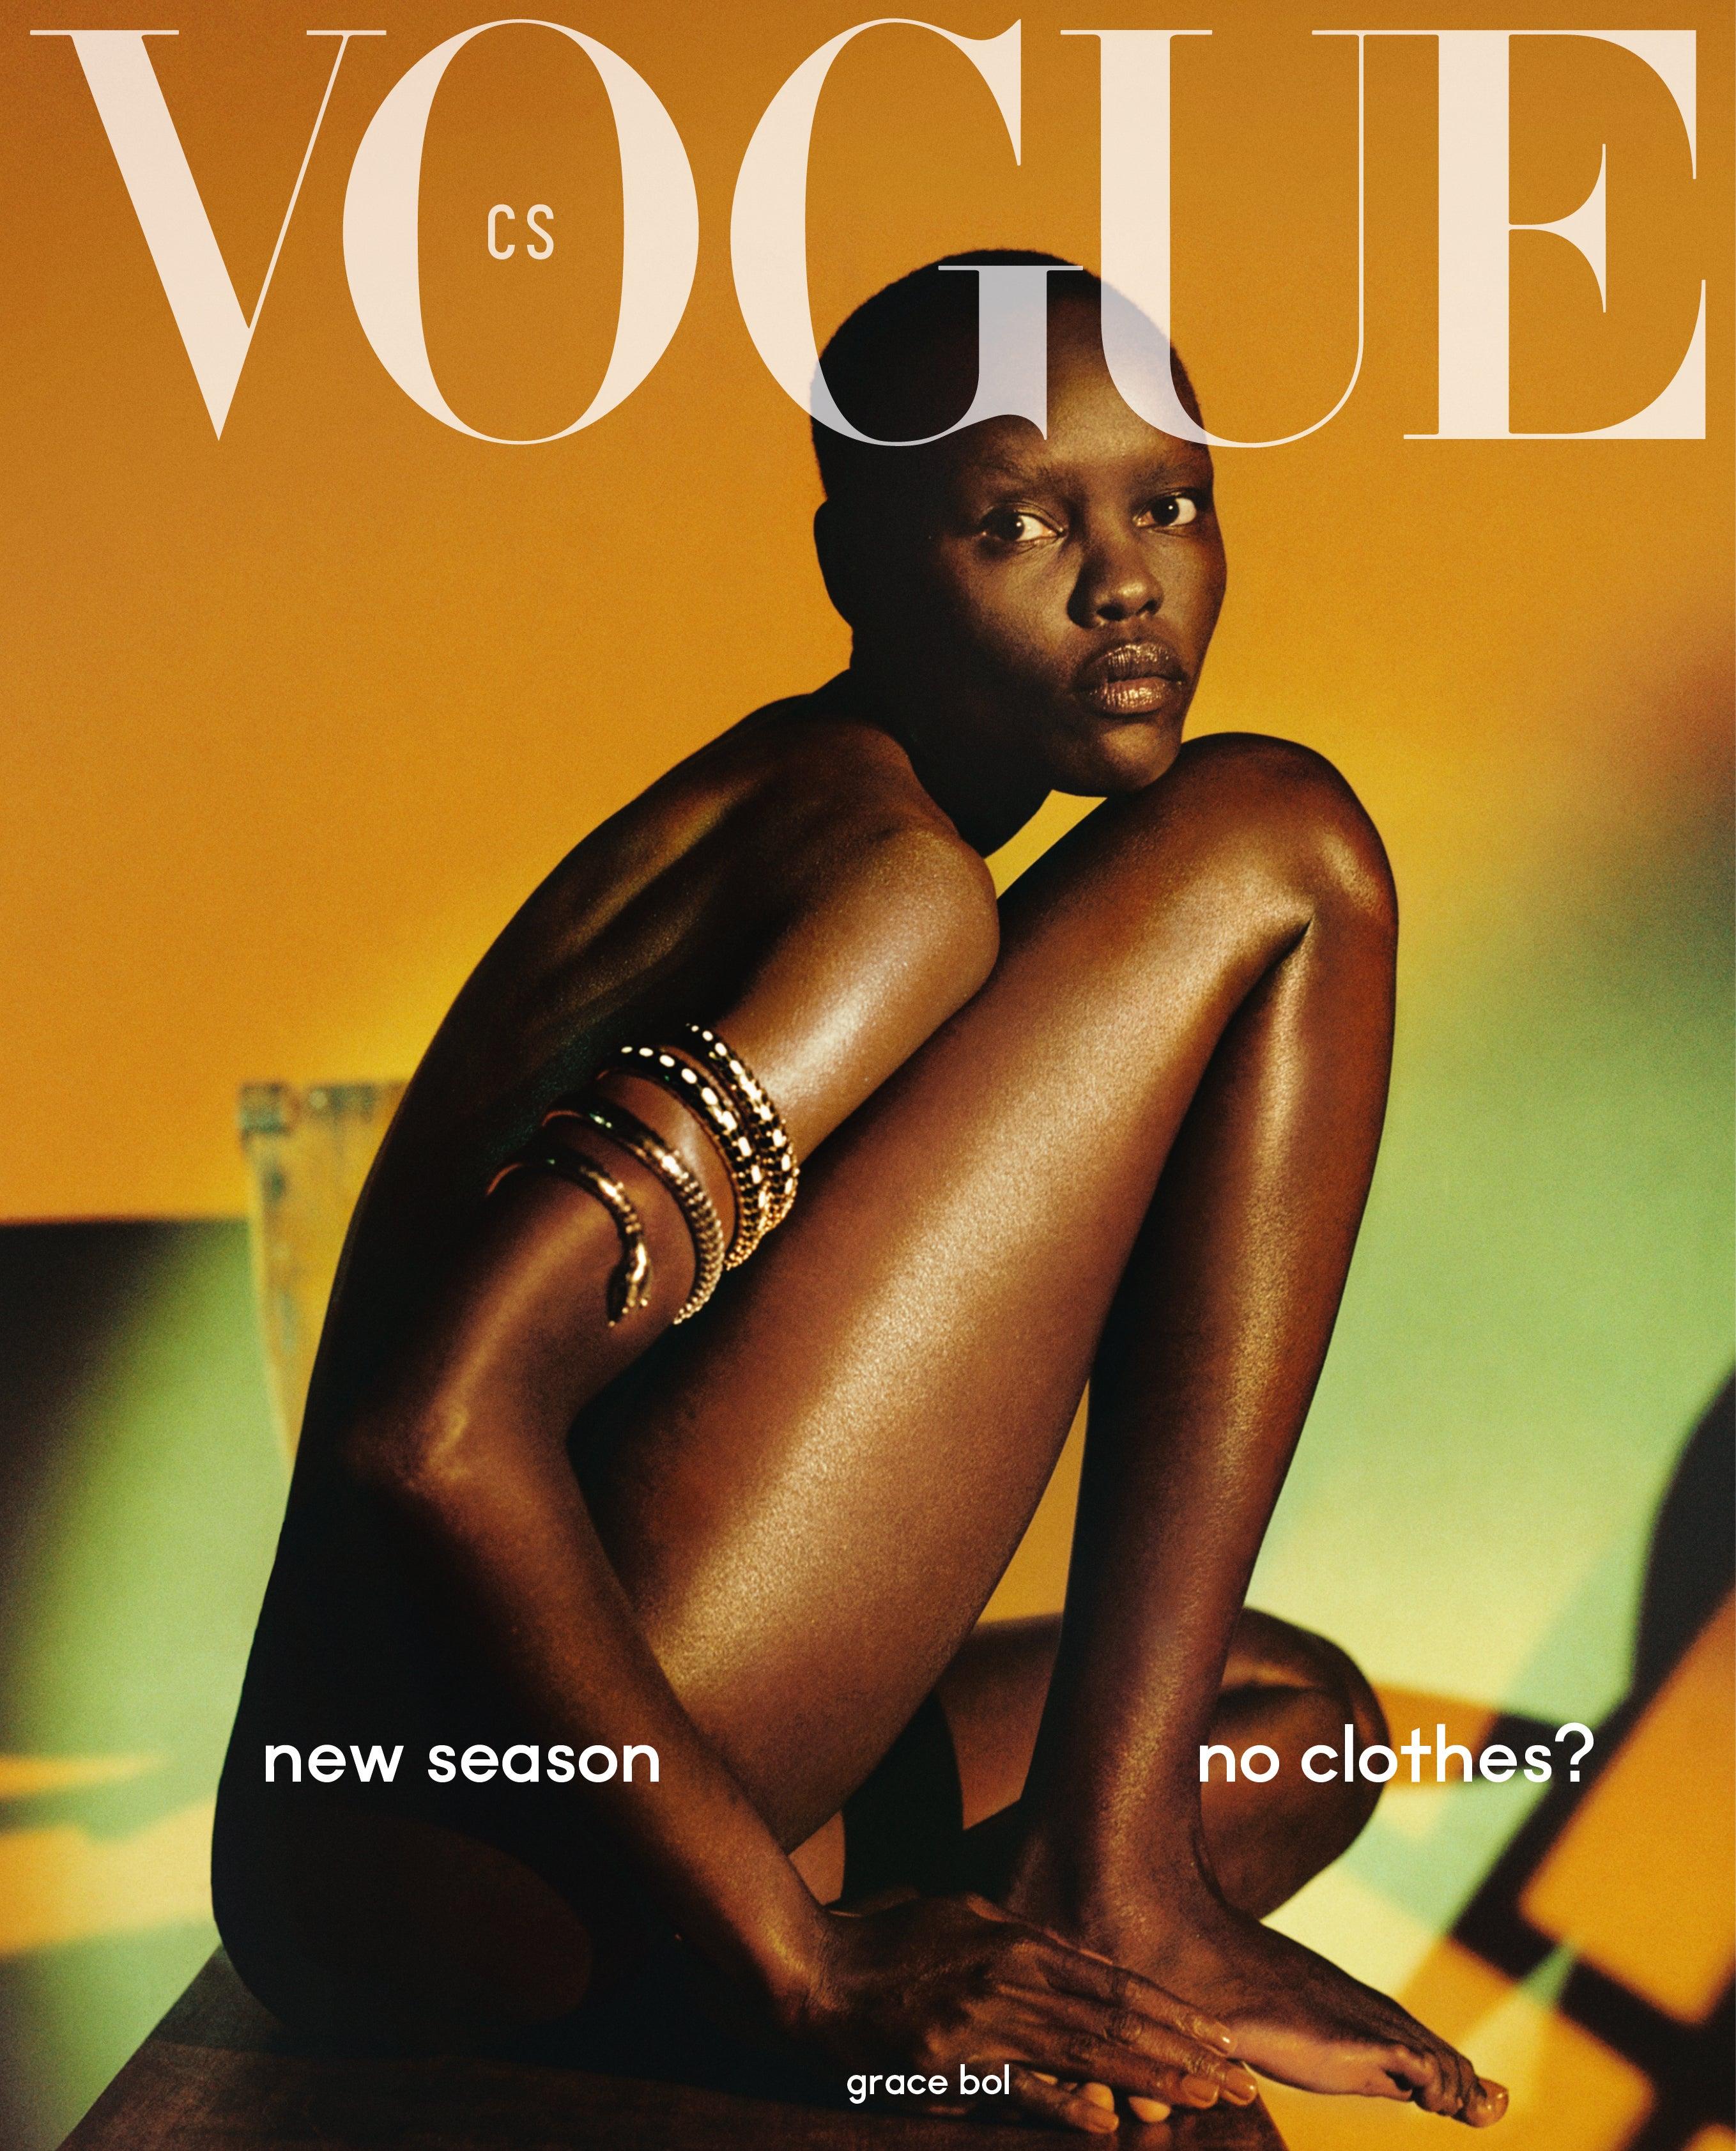 Vogue CS, číslo 12, září 2019 Autor: Dan Beleiu, Cover star: Grace Bol